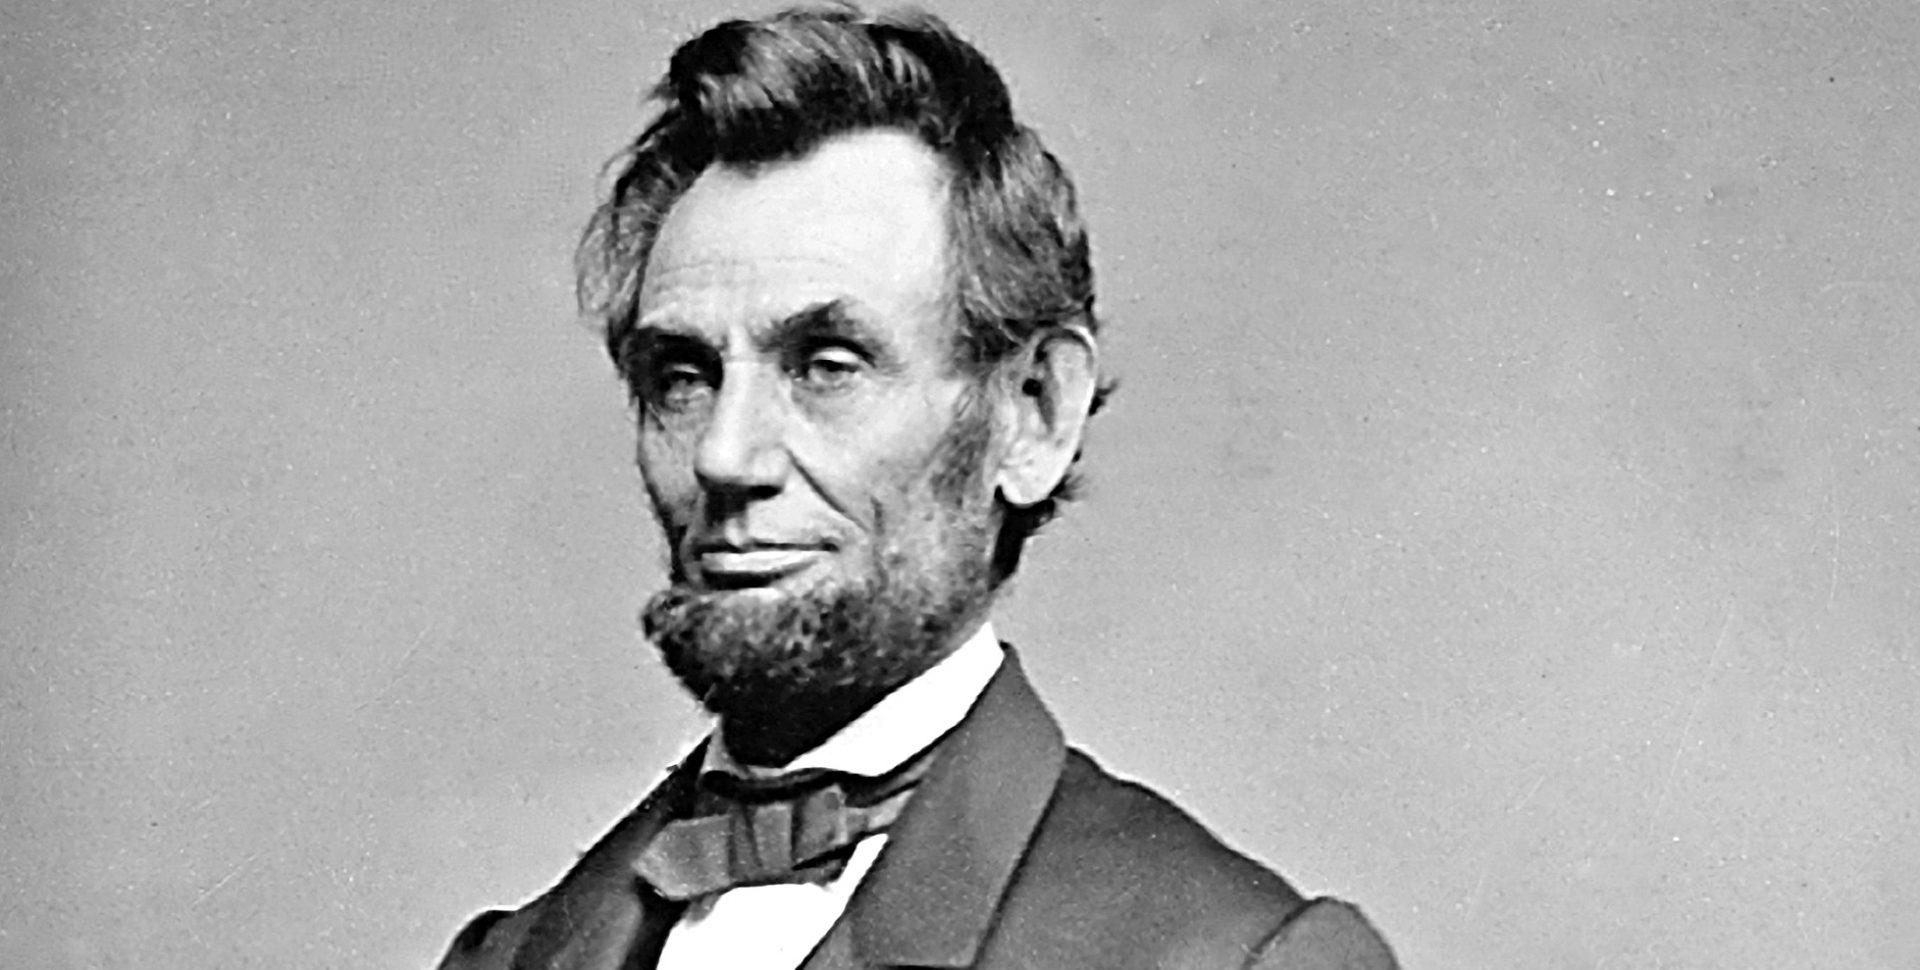 Abraham Lincoln, United States 16th President